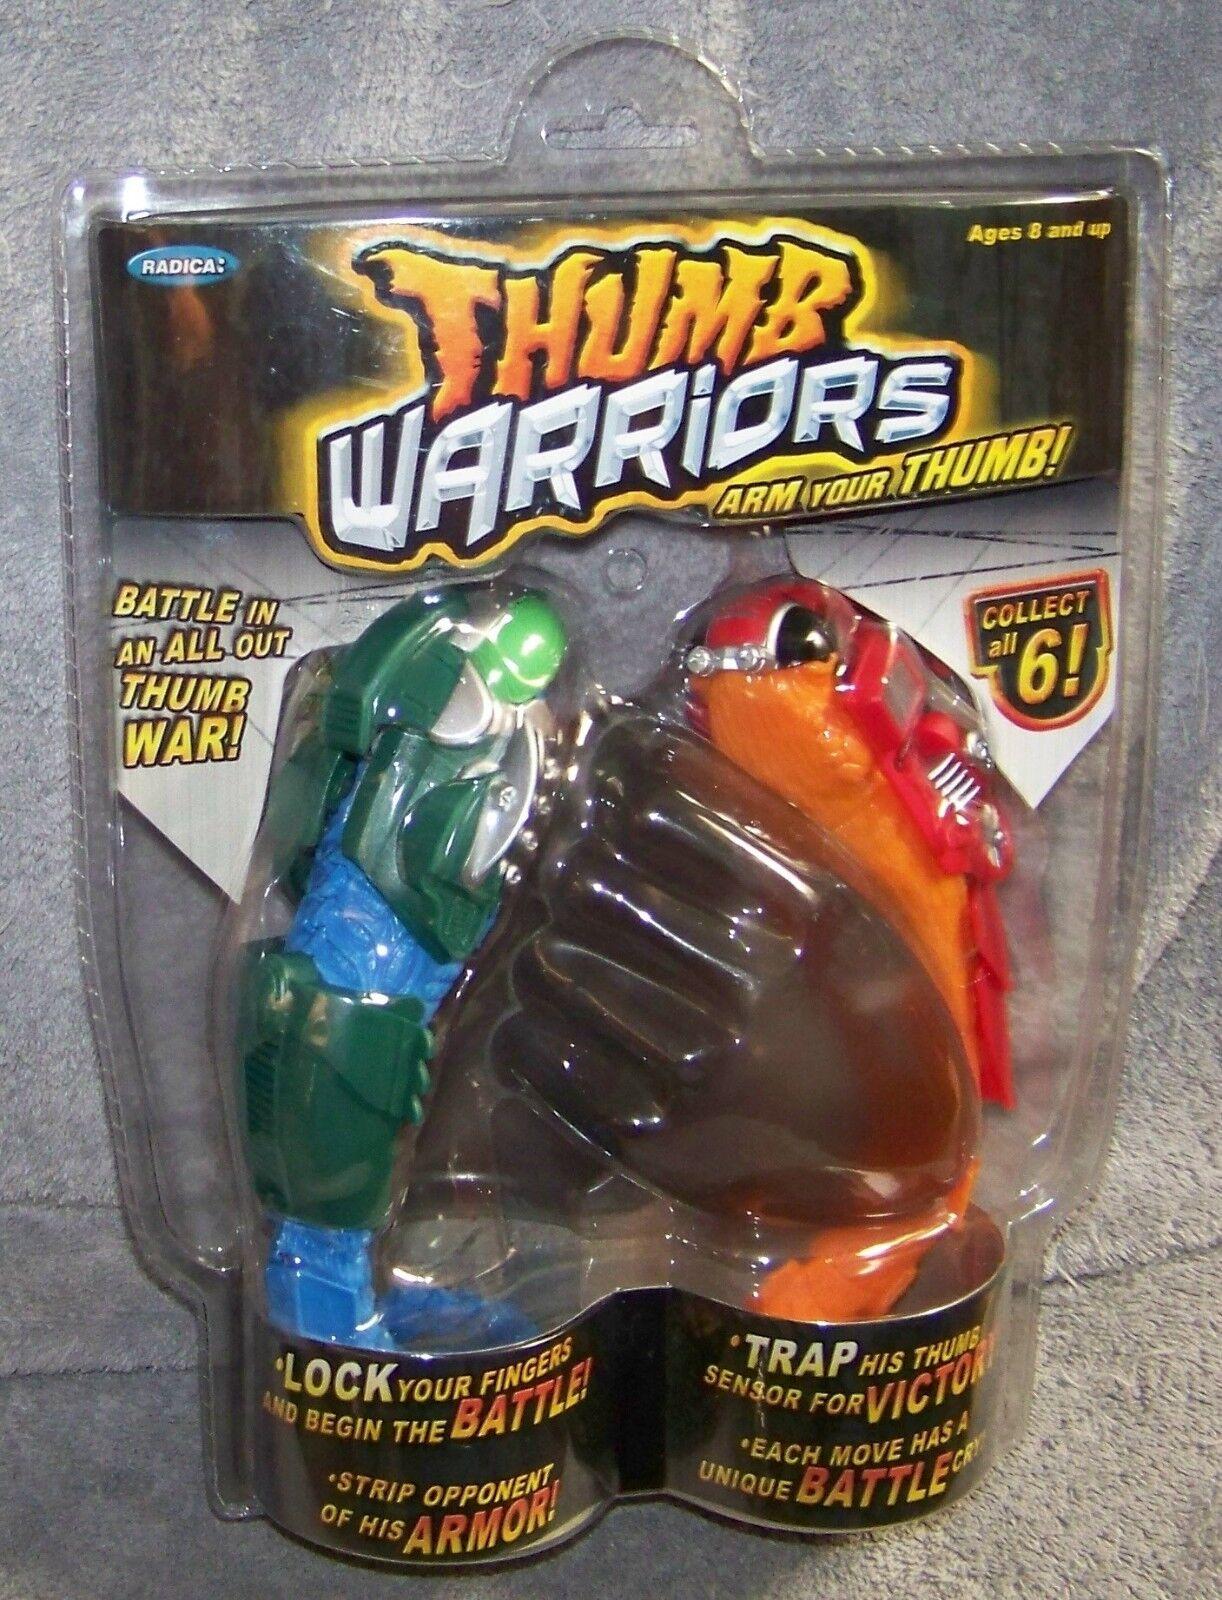 RADICA THUMB WARRIORS GAME THUMB WAR BATTLE MANTIS & MAGMA SET